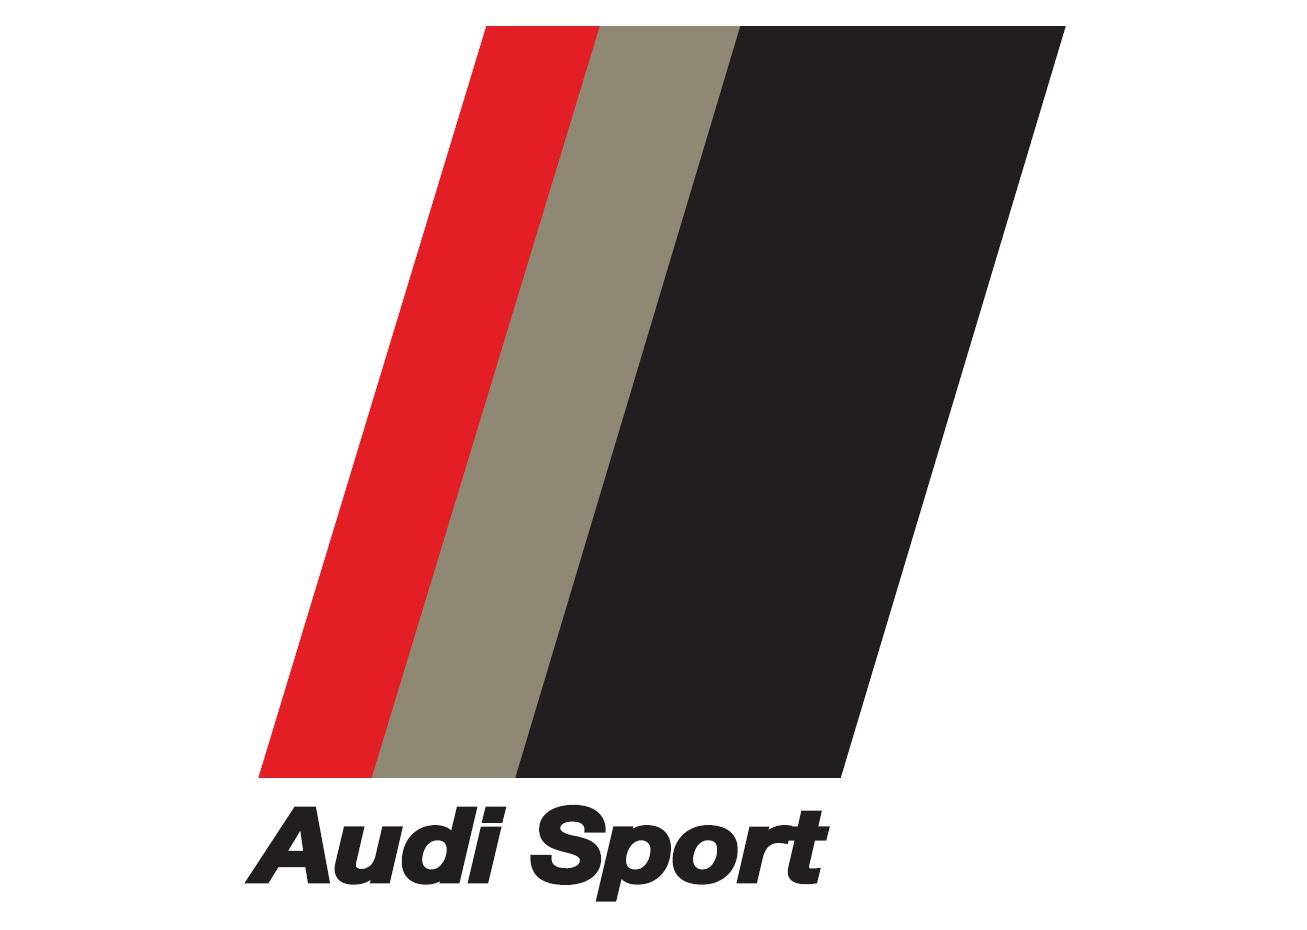 Audi Sport Emblem Quattroworldcom Forums New Audi Sport